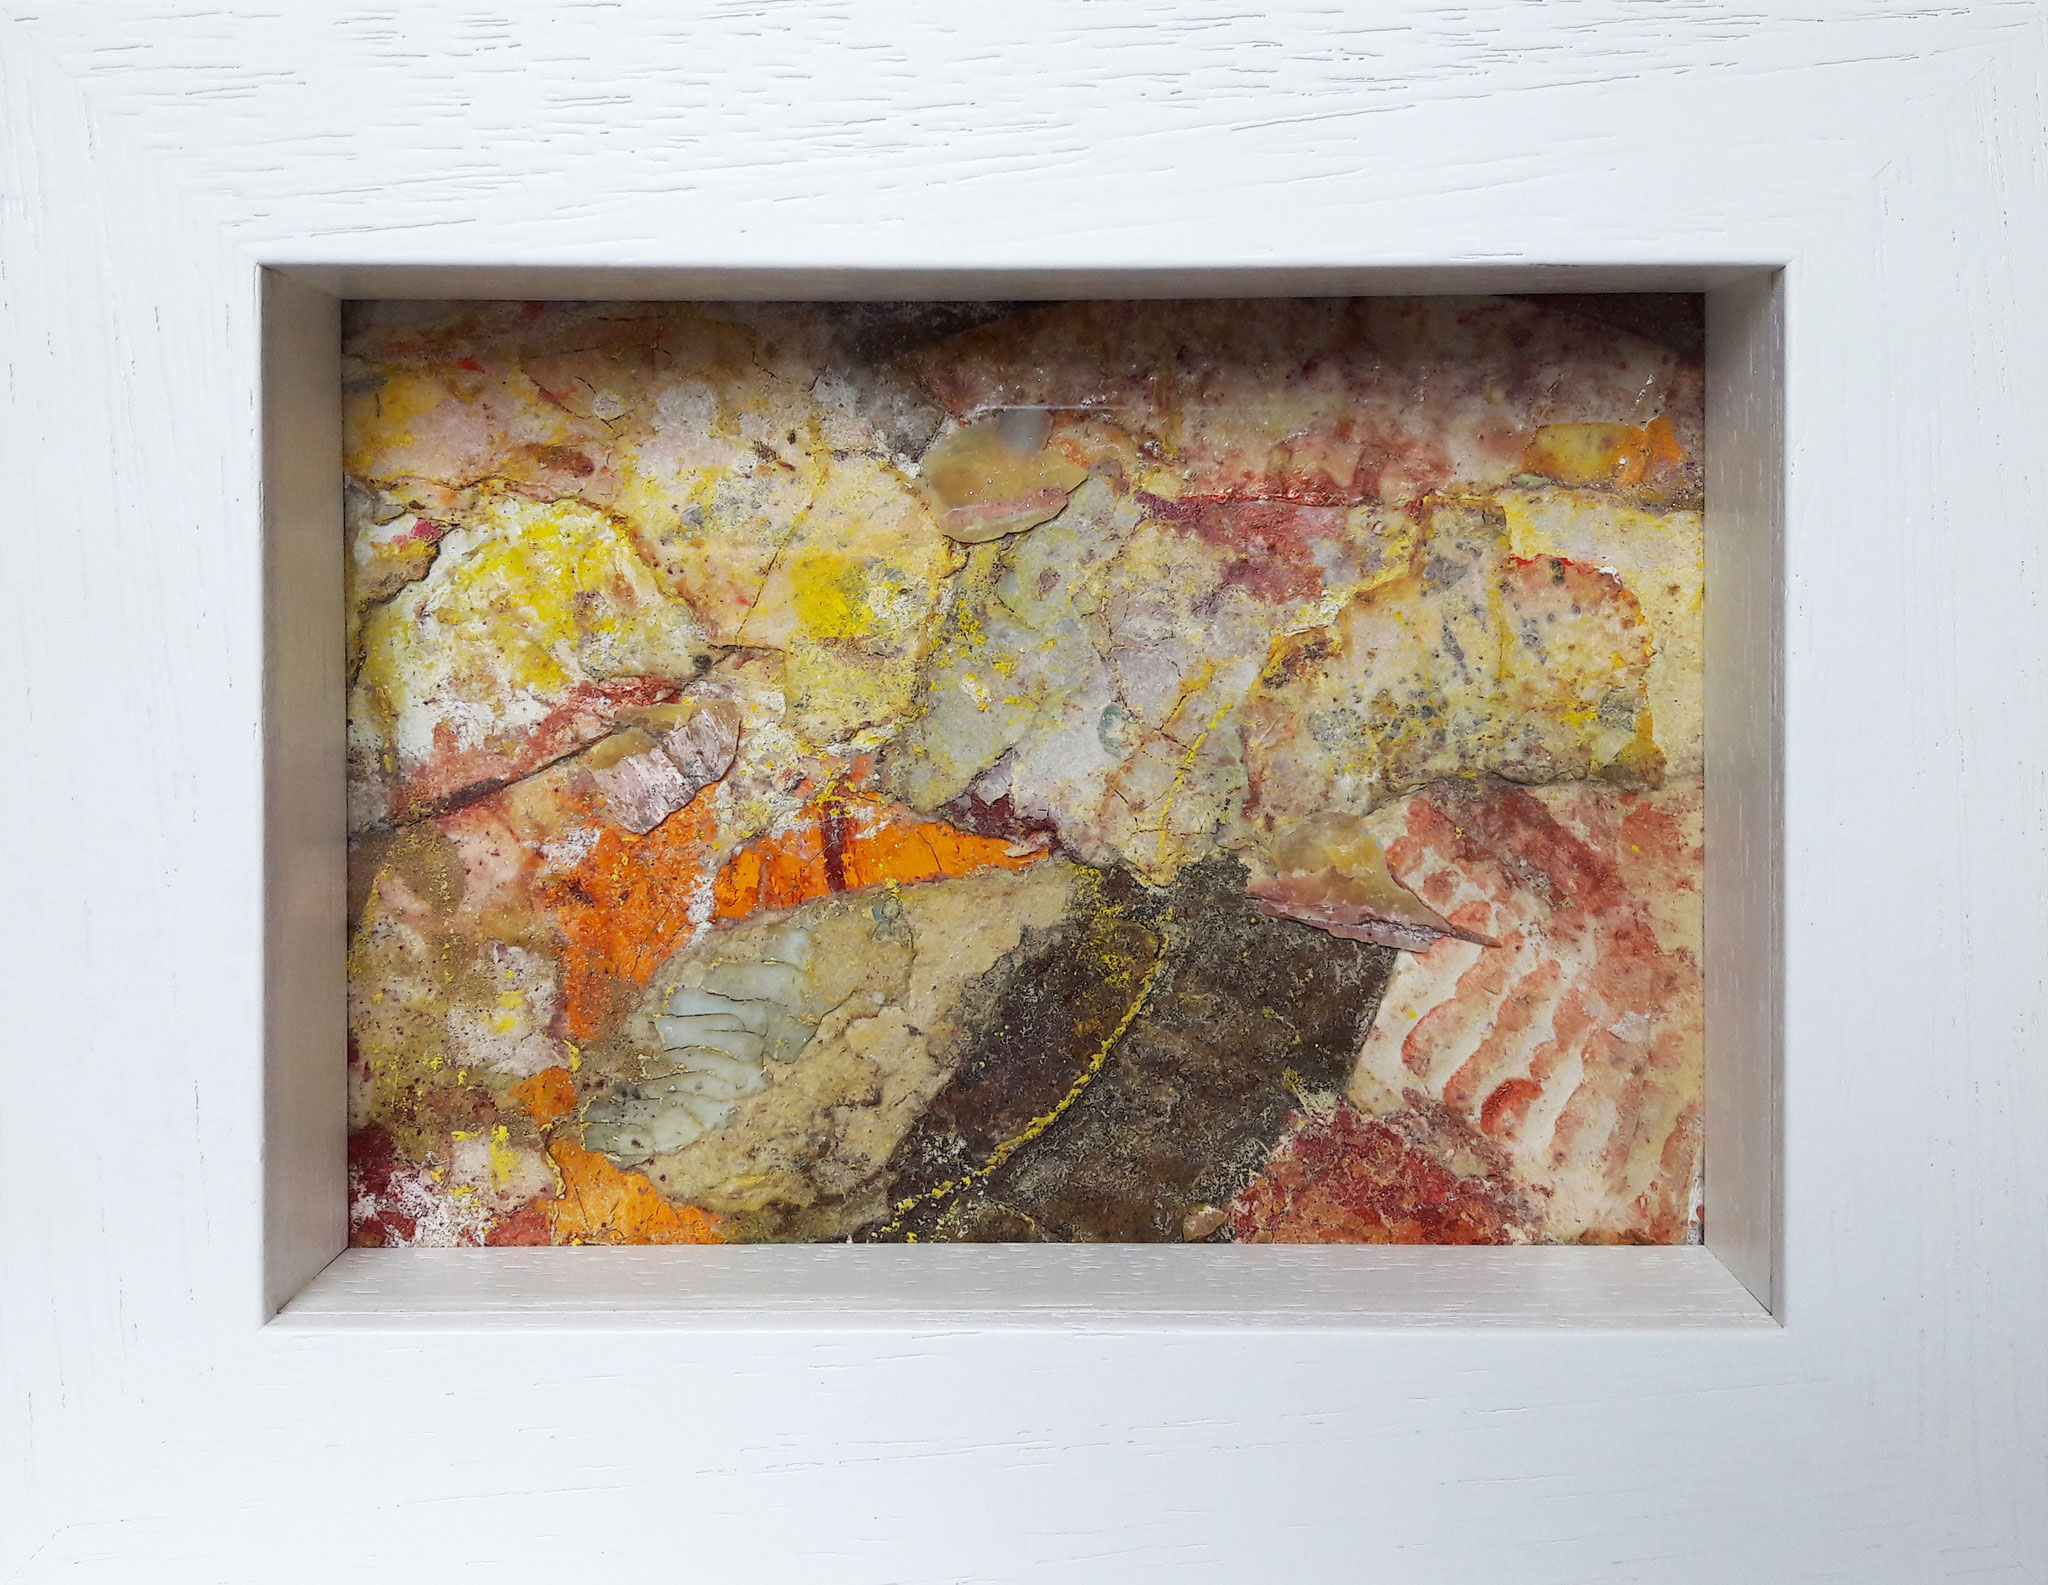 Papperlapapp 2, Acrylmischtechnik, 23 x 18 mit Rahmen, 2017, 140 Euro